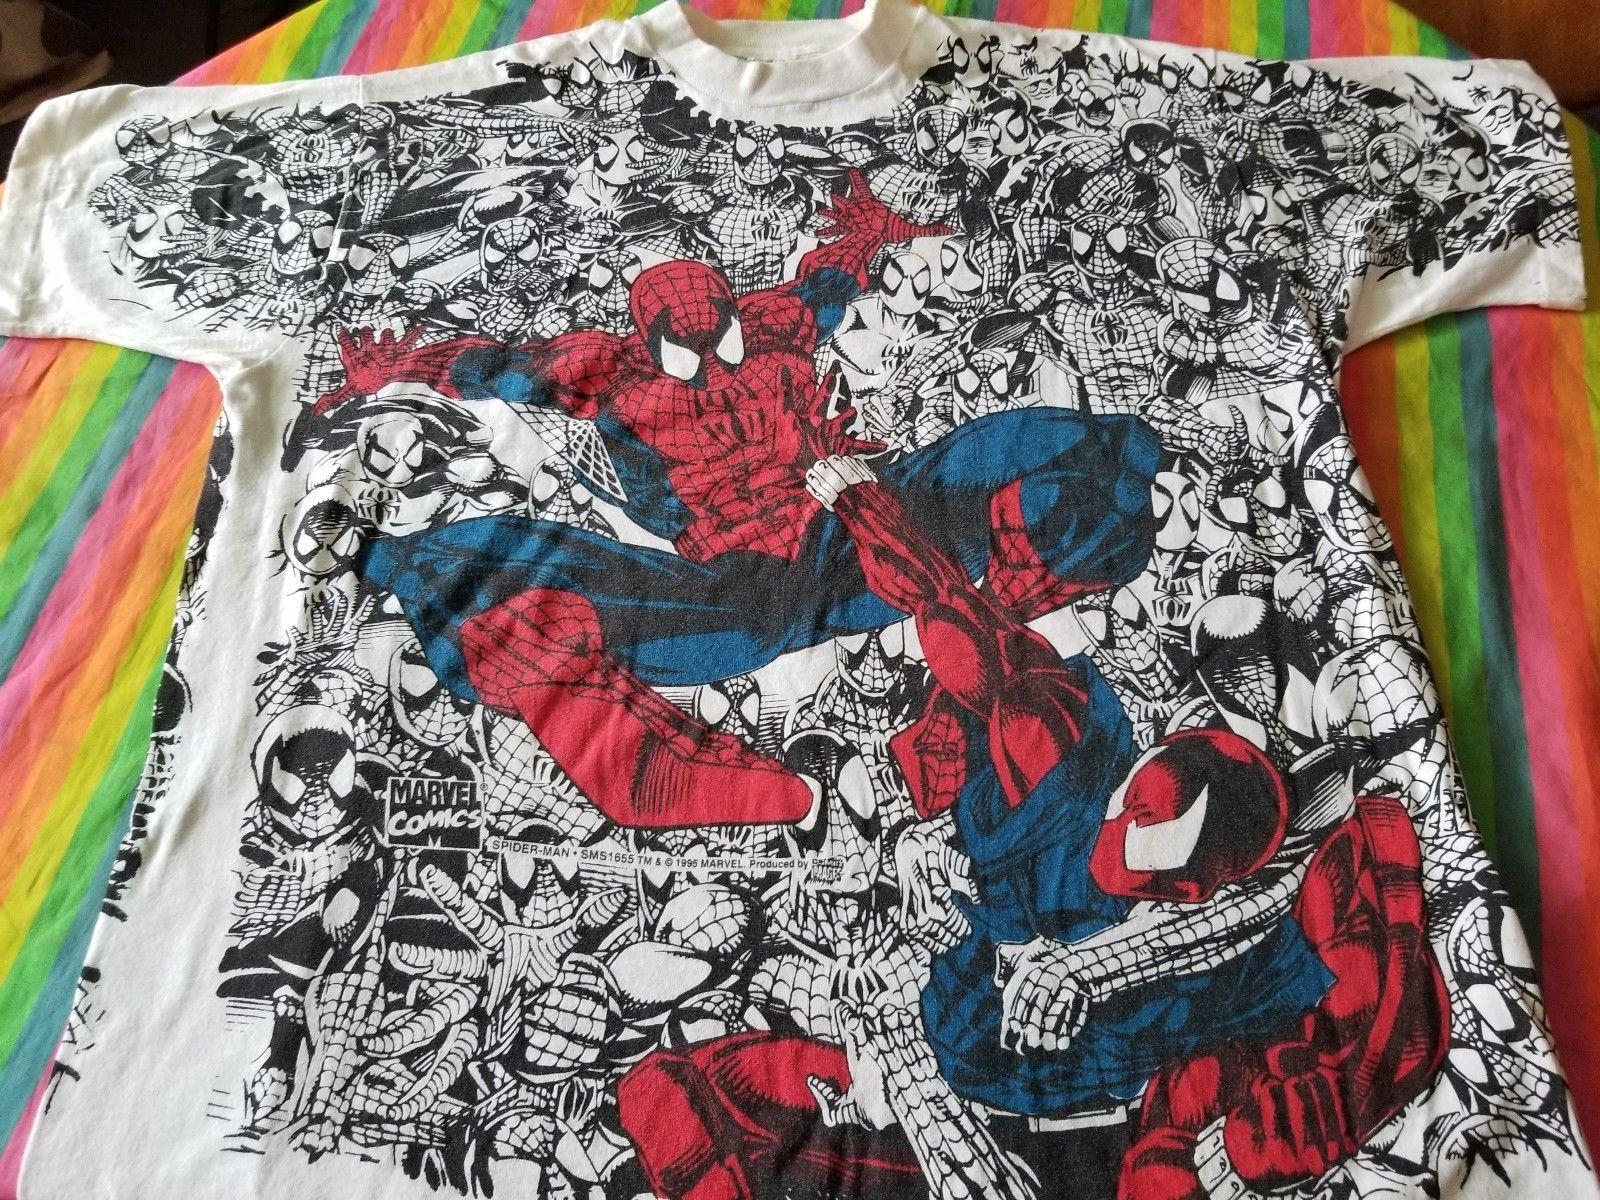 Spiderman Vintage All Over Print Tee Shirt Xl Clean N Rare 95 Tee Shirt Print Marvel Shirt Spiderman Shirt